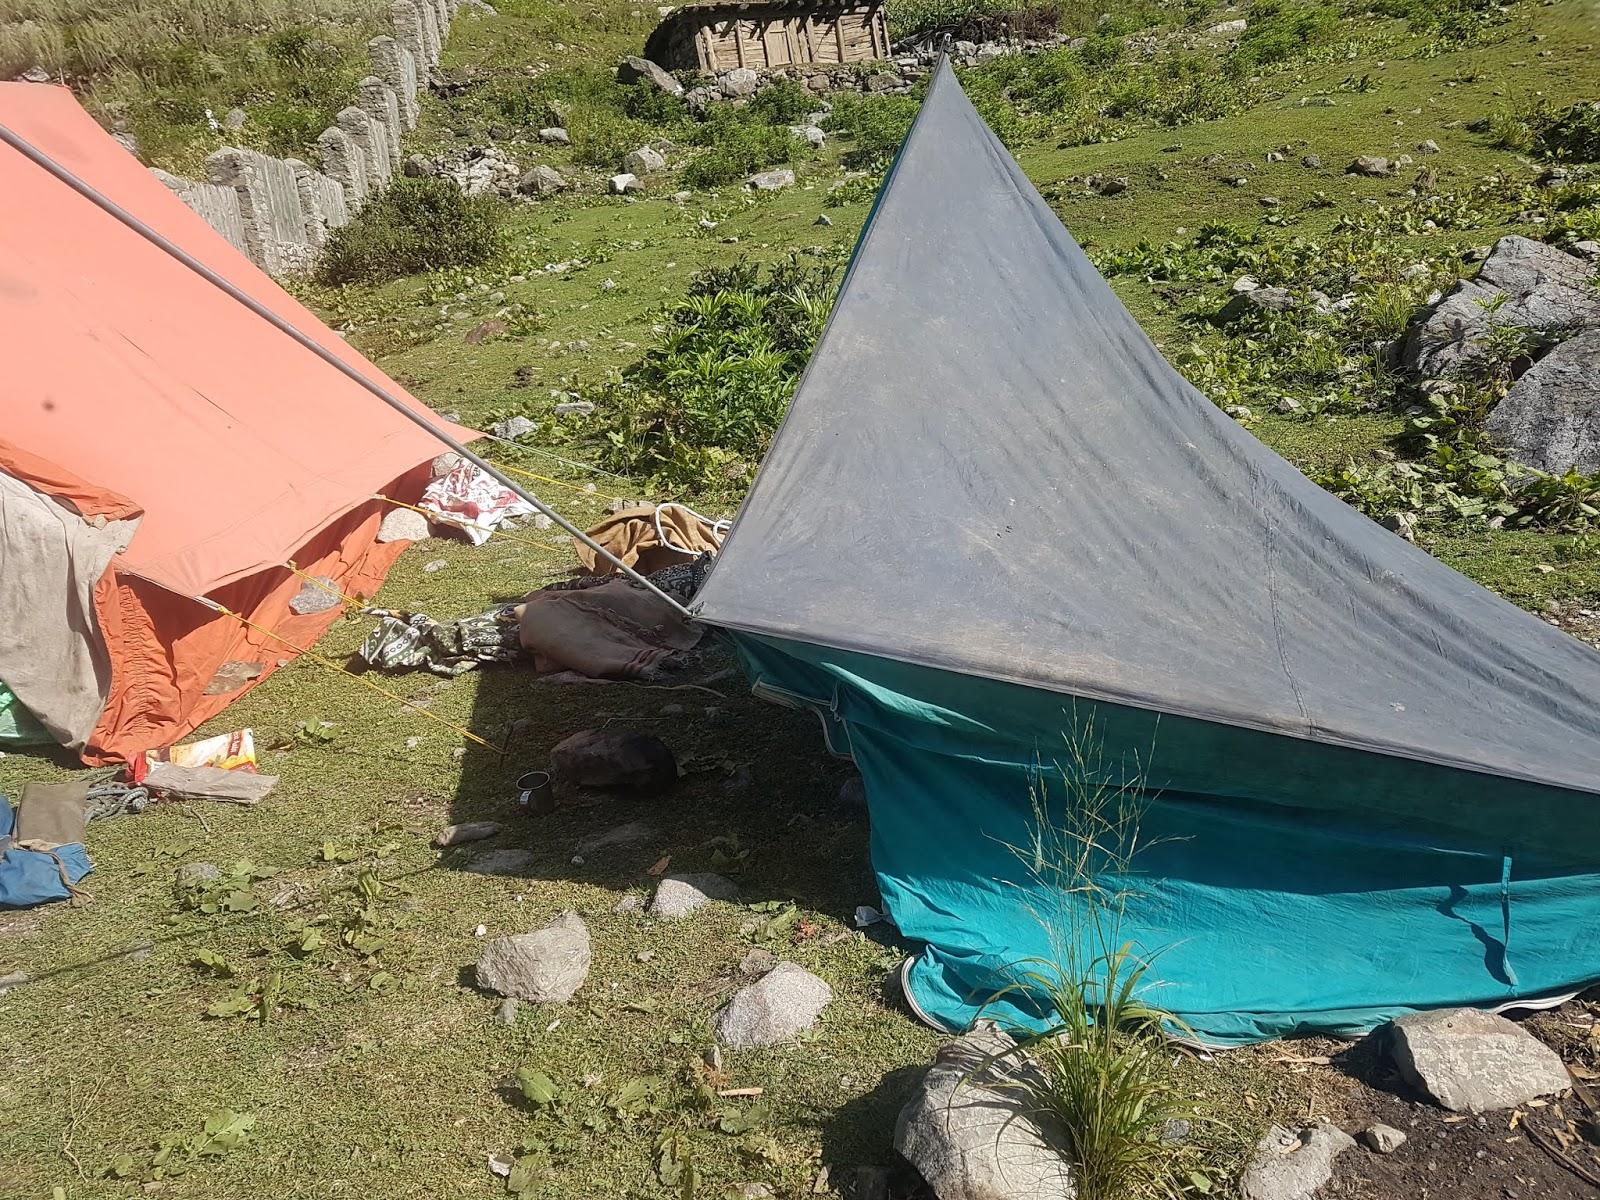 Camping in Naranag, Kashmir